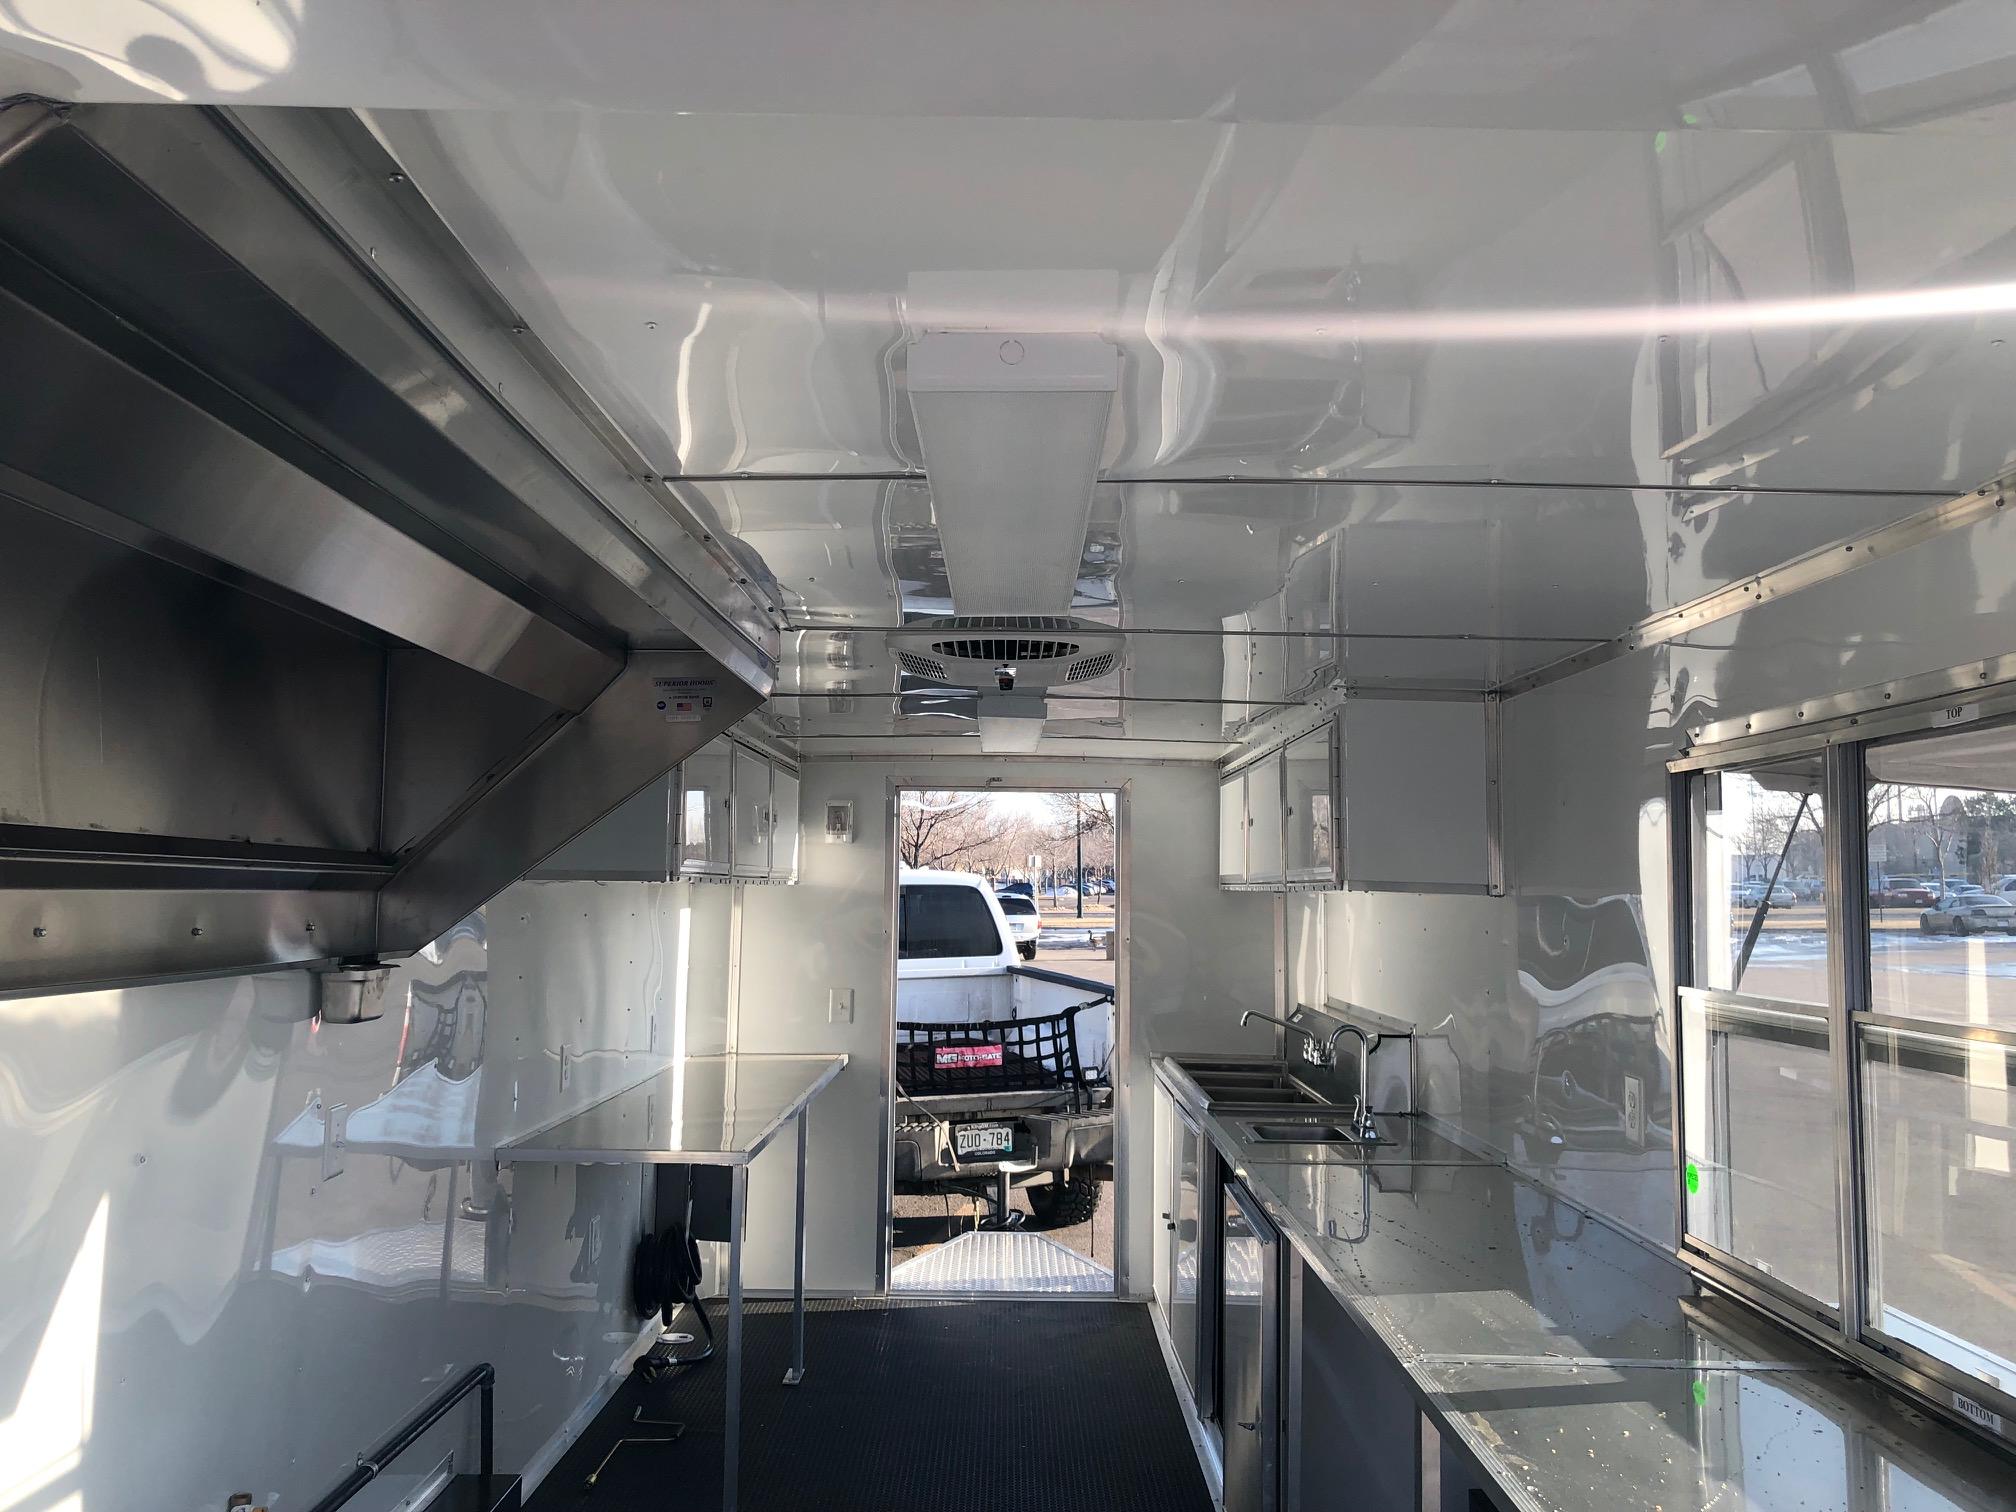 Brand New 2019 Anvil Custom Food Trailer For Sale In Denver Food Truck Empire